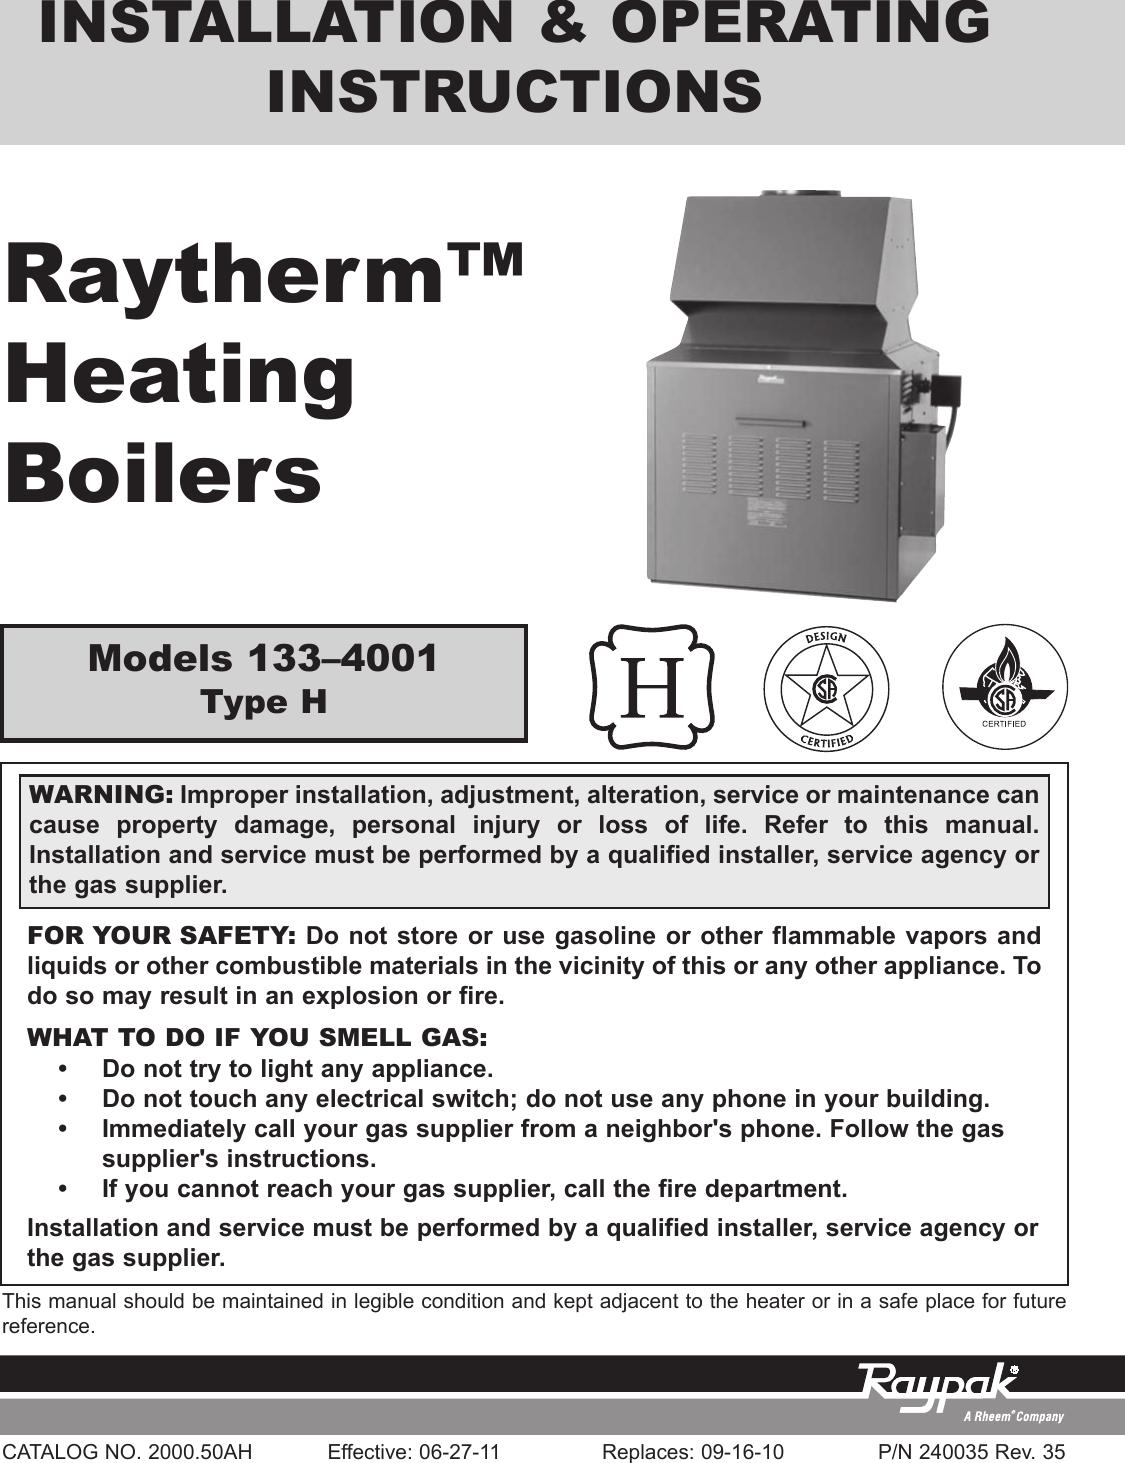 Raypak Boiler Manuals Model 0133 4001 - Daily Instruction Manual ...